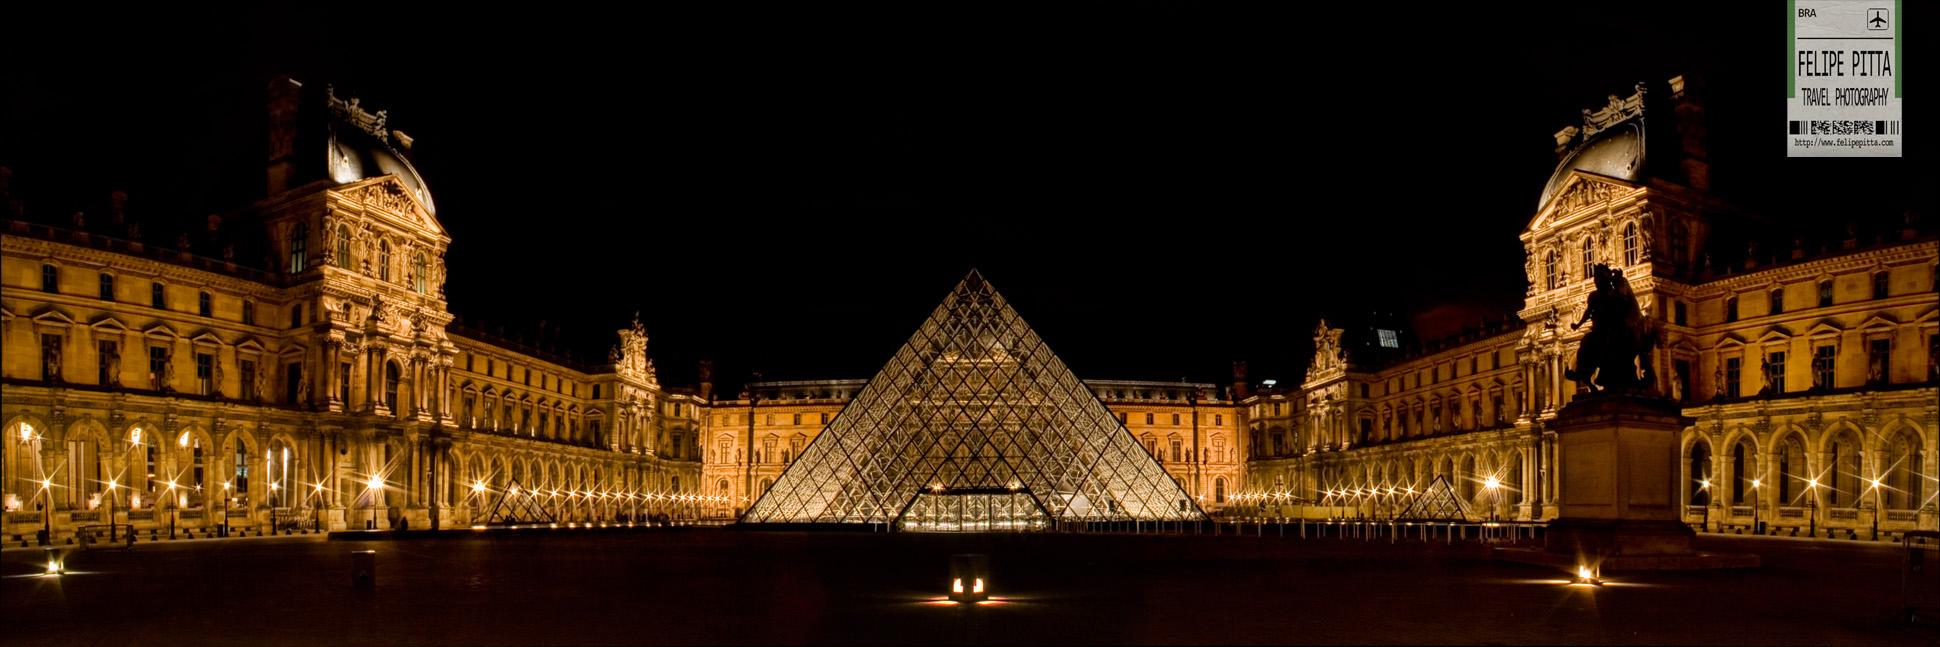 Louvre Museum Glass Pyramid Paris France Pan